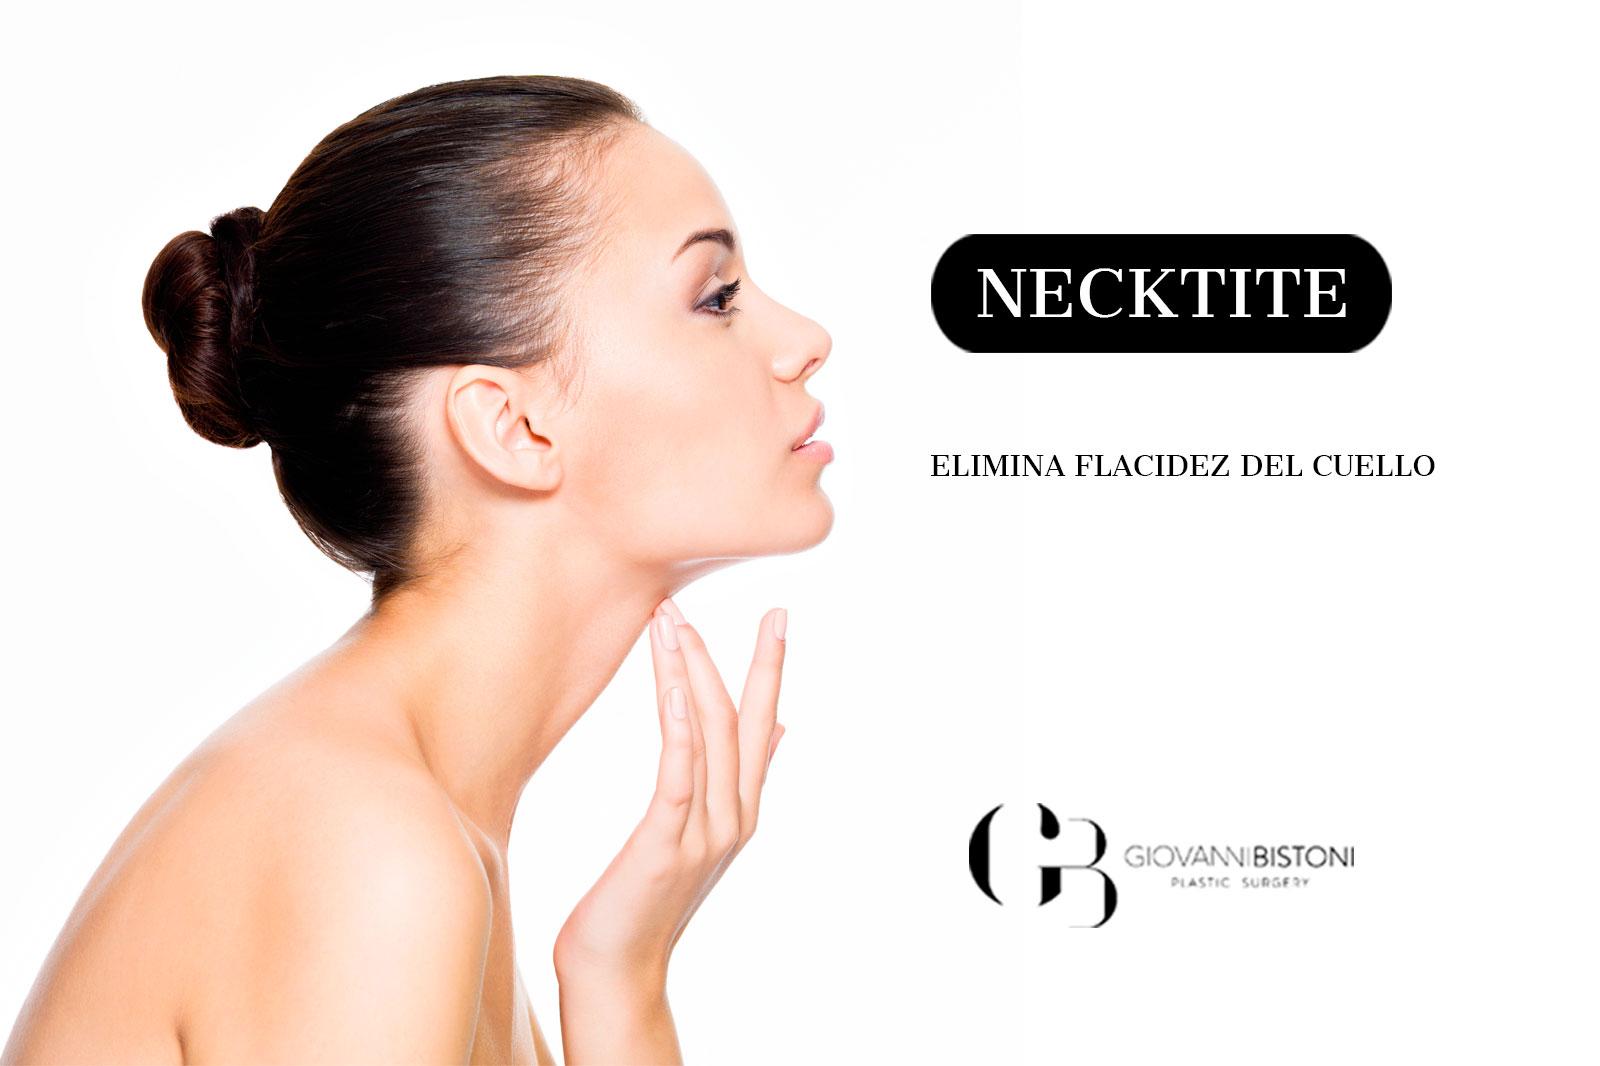 Necktite elimina flacidez del cuello